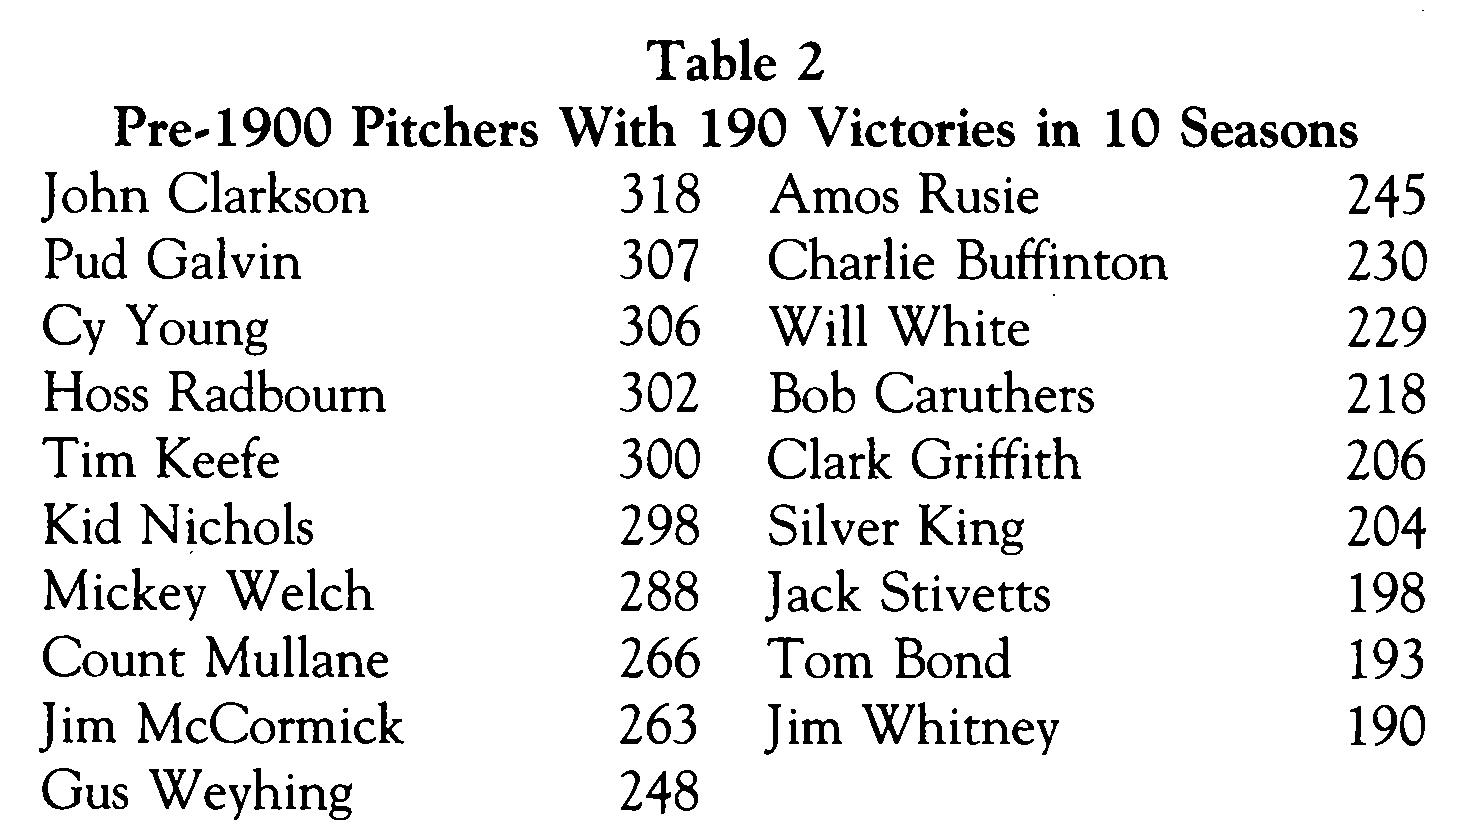 Stephen Cunerd: Table 2